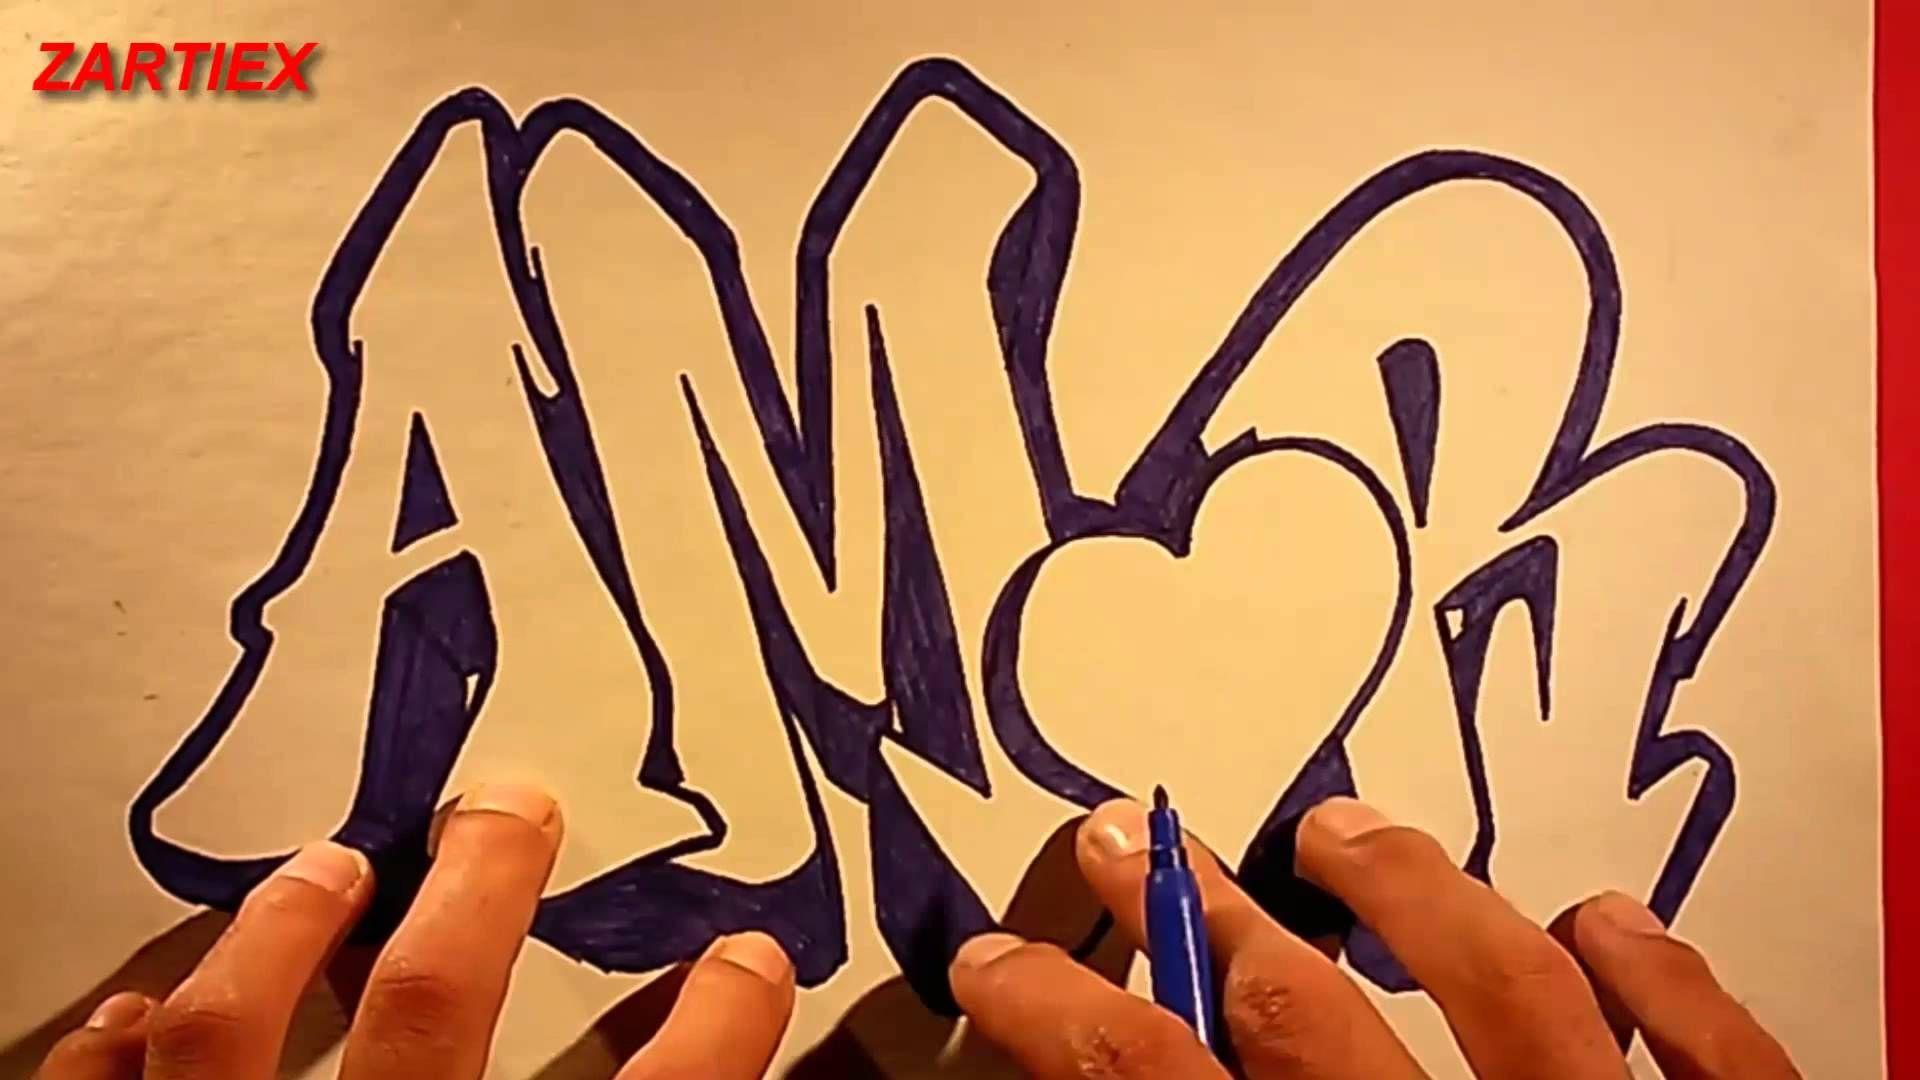 Como hacer letras 3d dibujos de amor bonitos faciles para regalar a mi novia FACEBOOK https//www.facebook.com/ArteZartiex/ TWITTER https//twit\u2026